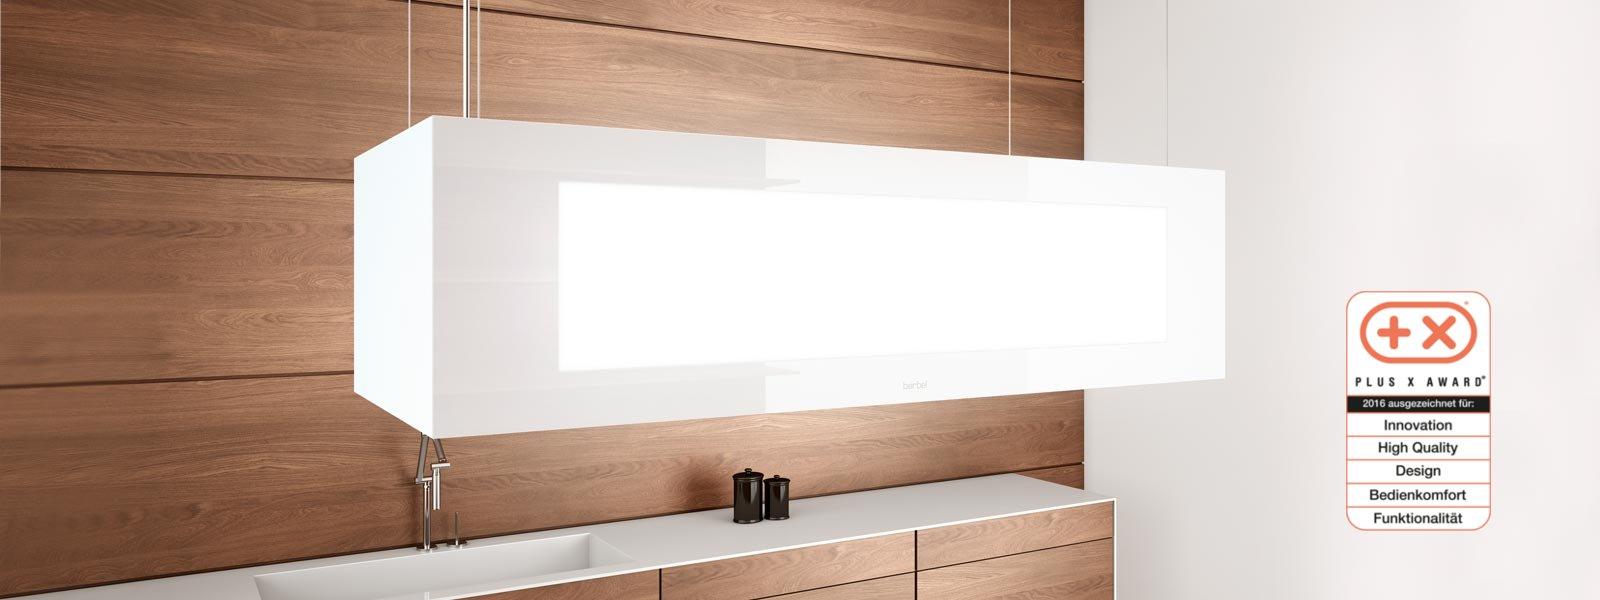 berbel-produktabb-bdl-skyline-edge-light-hJ0G34vXrA54wy